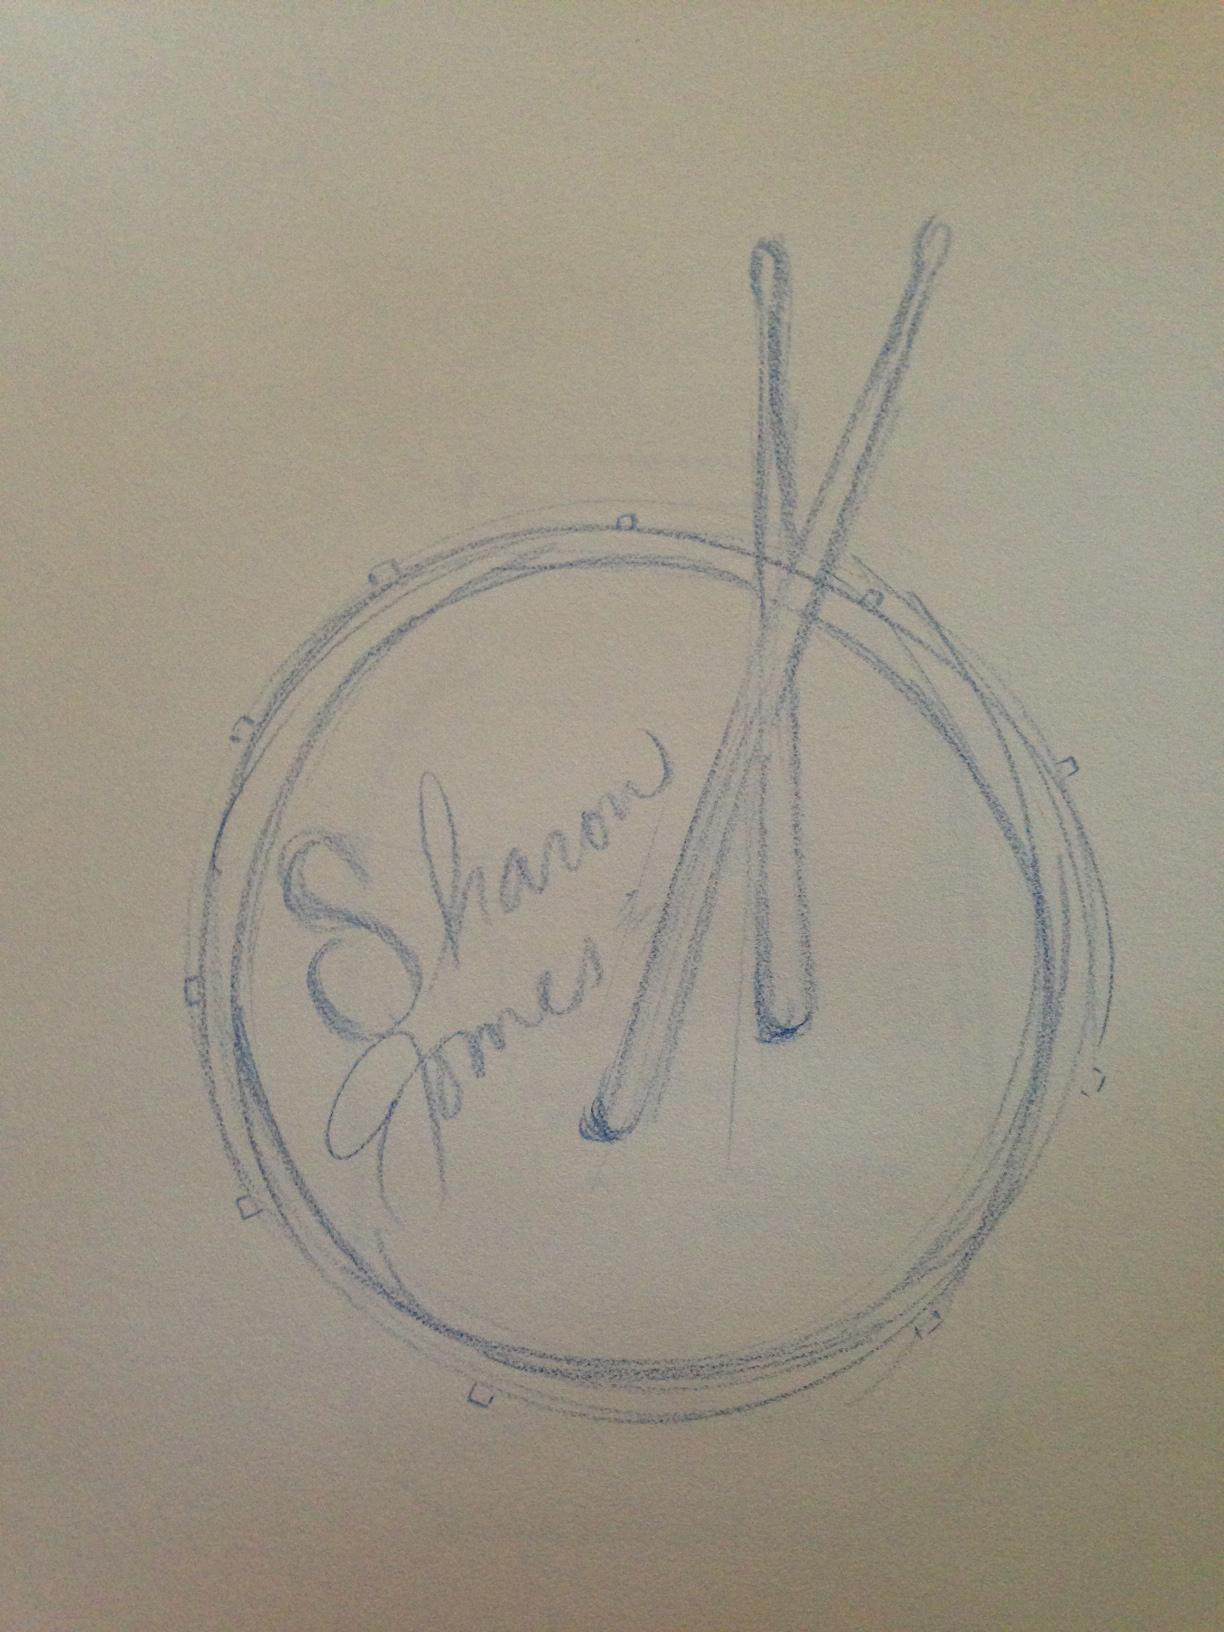 Sharon Jones and the Dap Kings - image 2 - student project